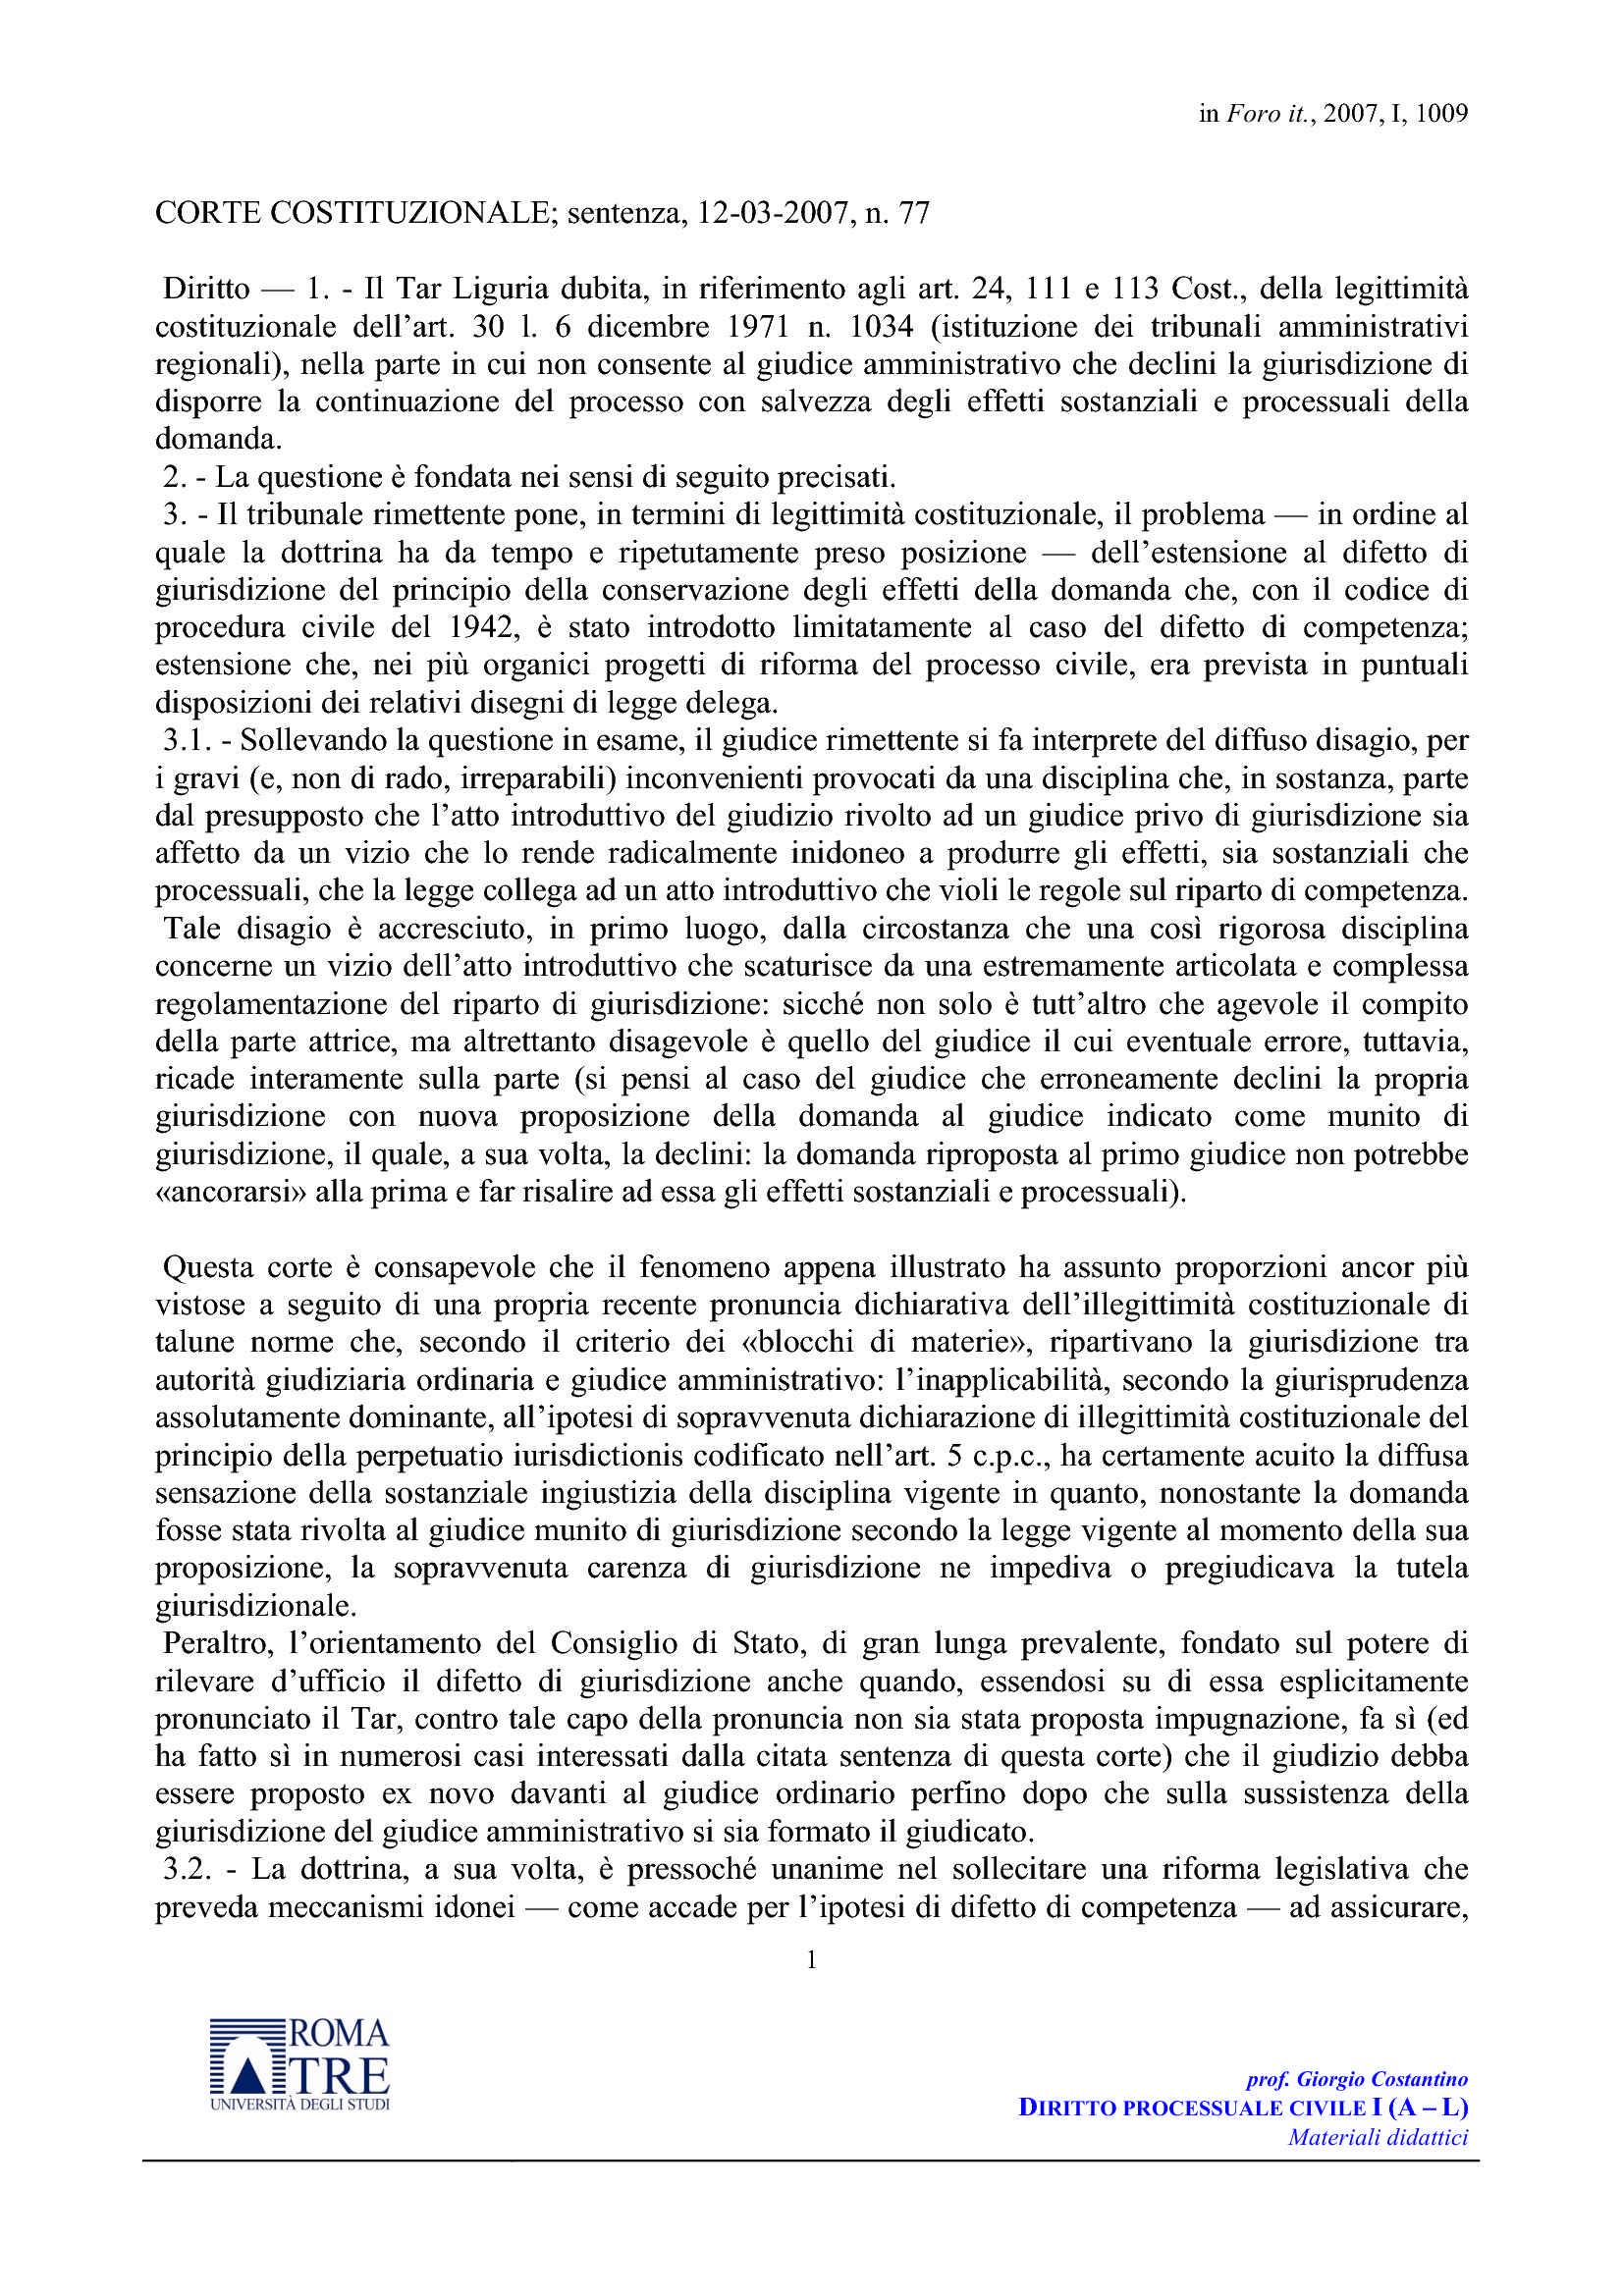 Traslatio iudicii - C. Cost. n. 77/07